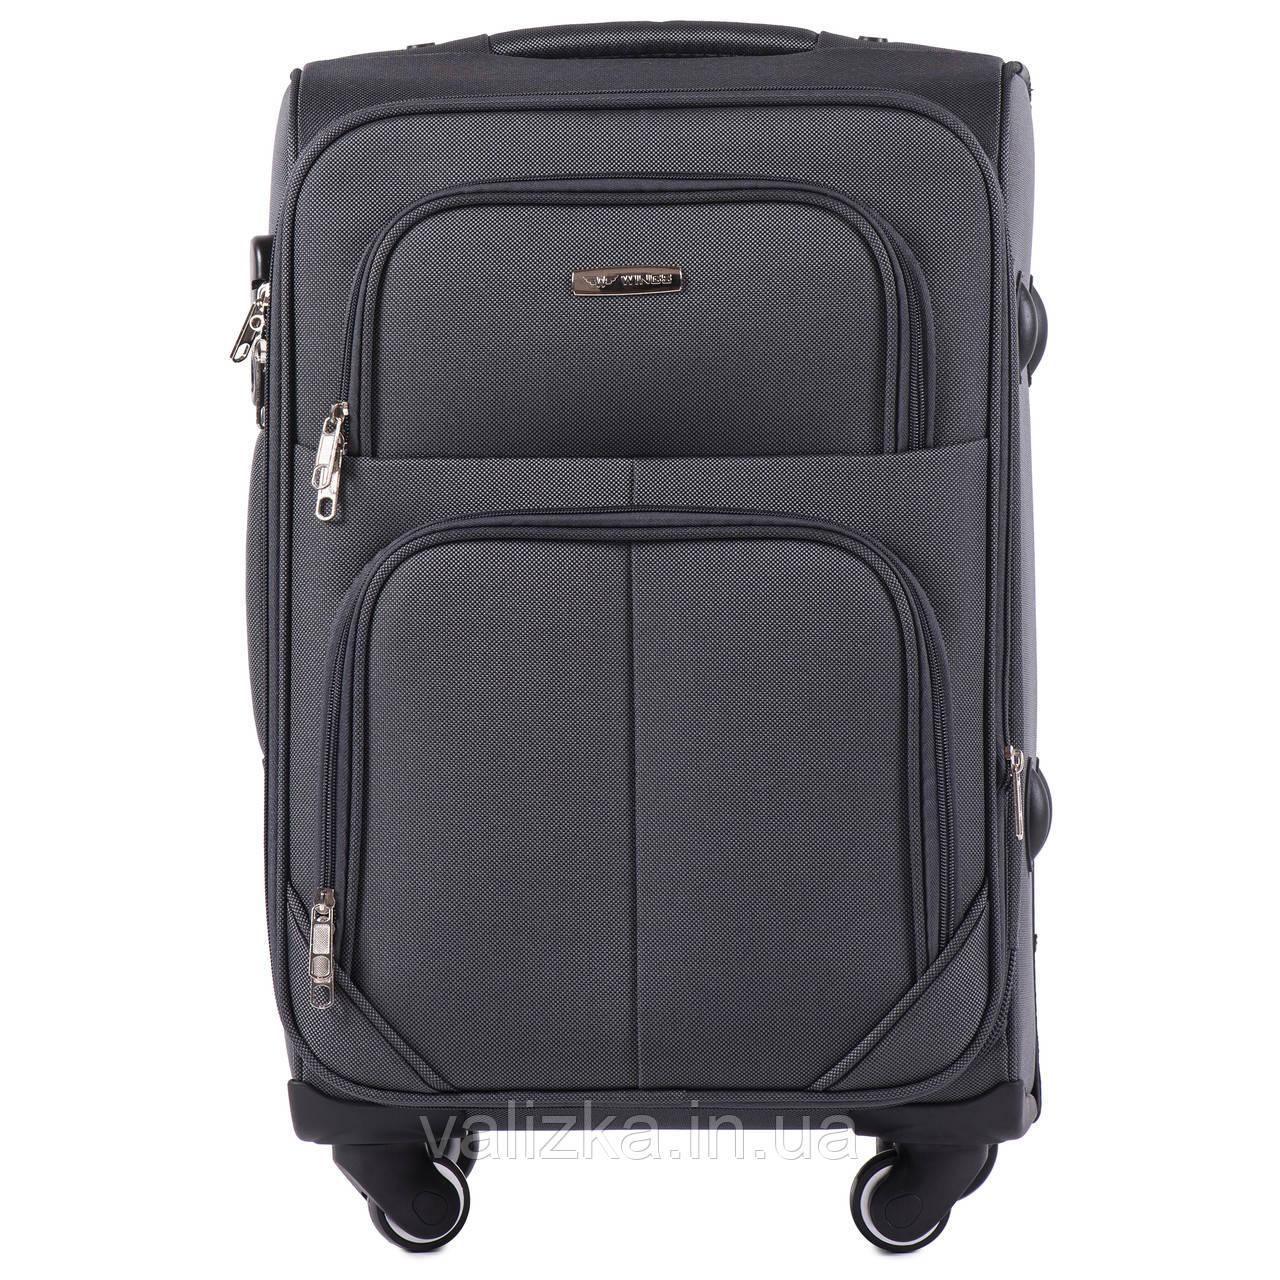 Малый текстильный чемодан на 4-х колесах темно-серый Wings